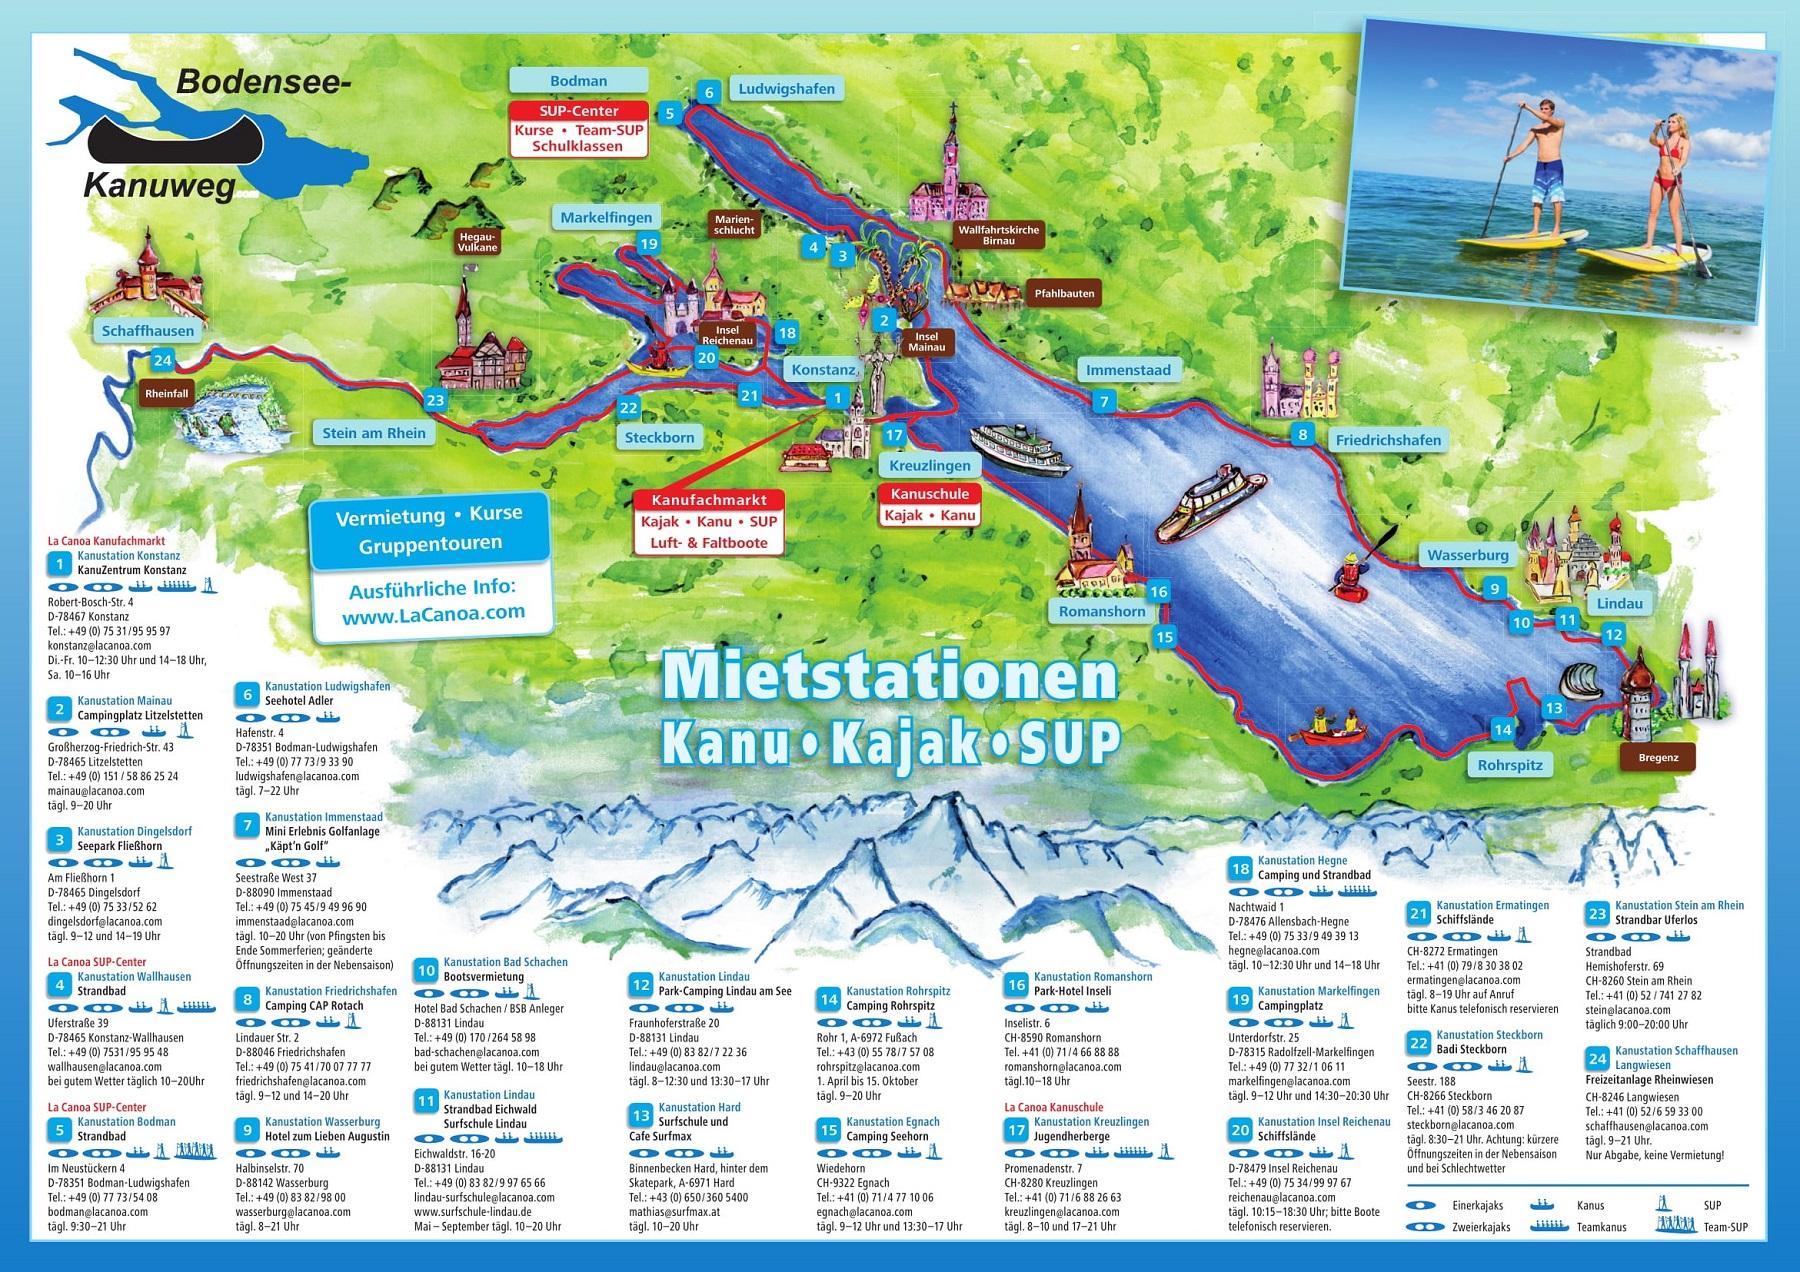 Bodensee-Kanuweg Mietstationen